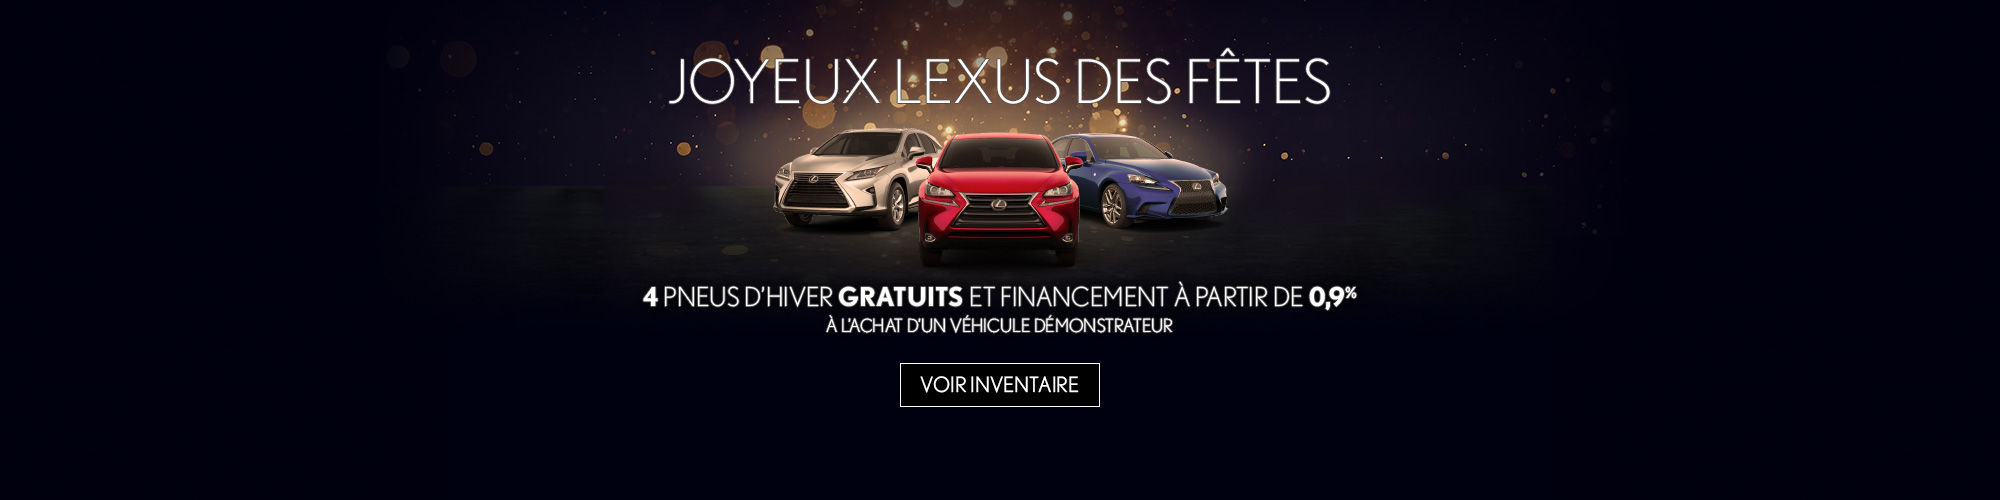 Vente de démos Lexus